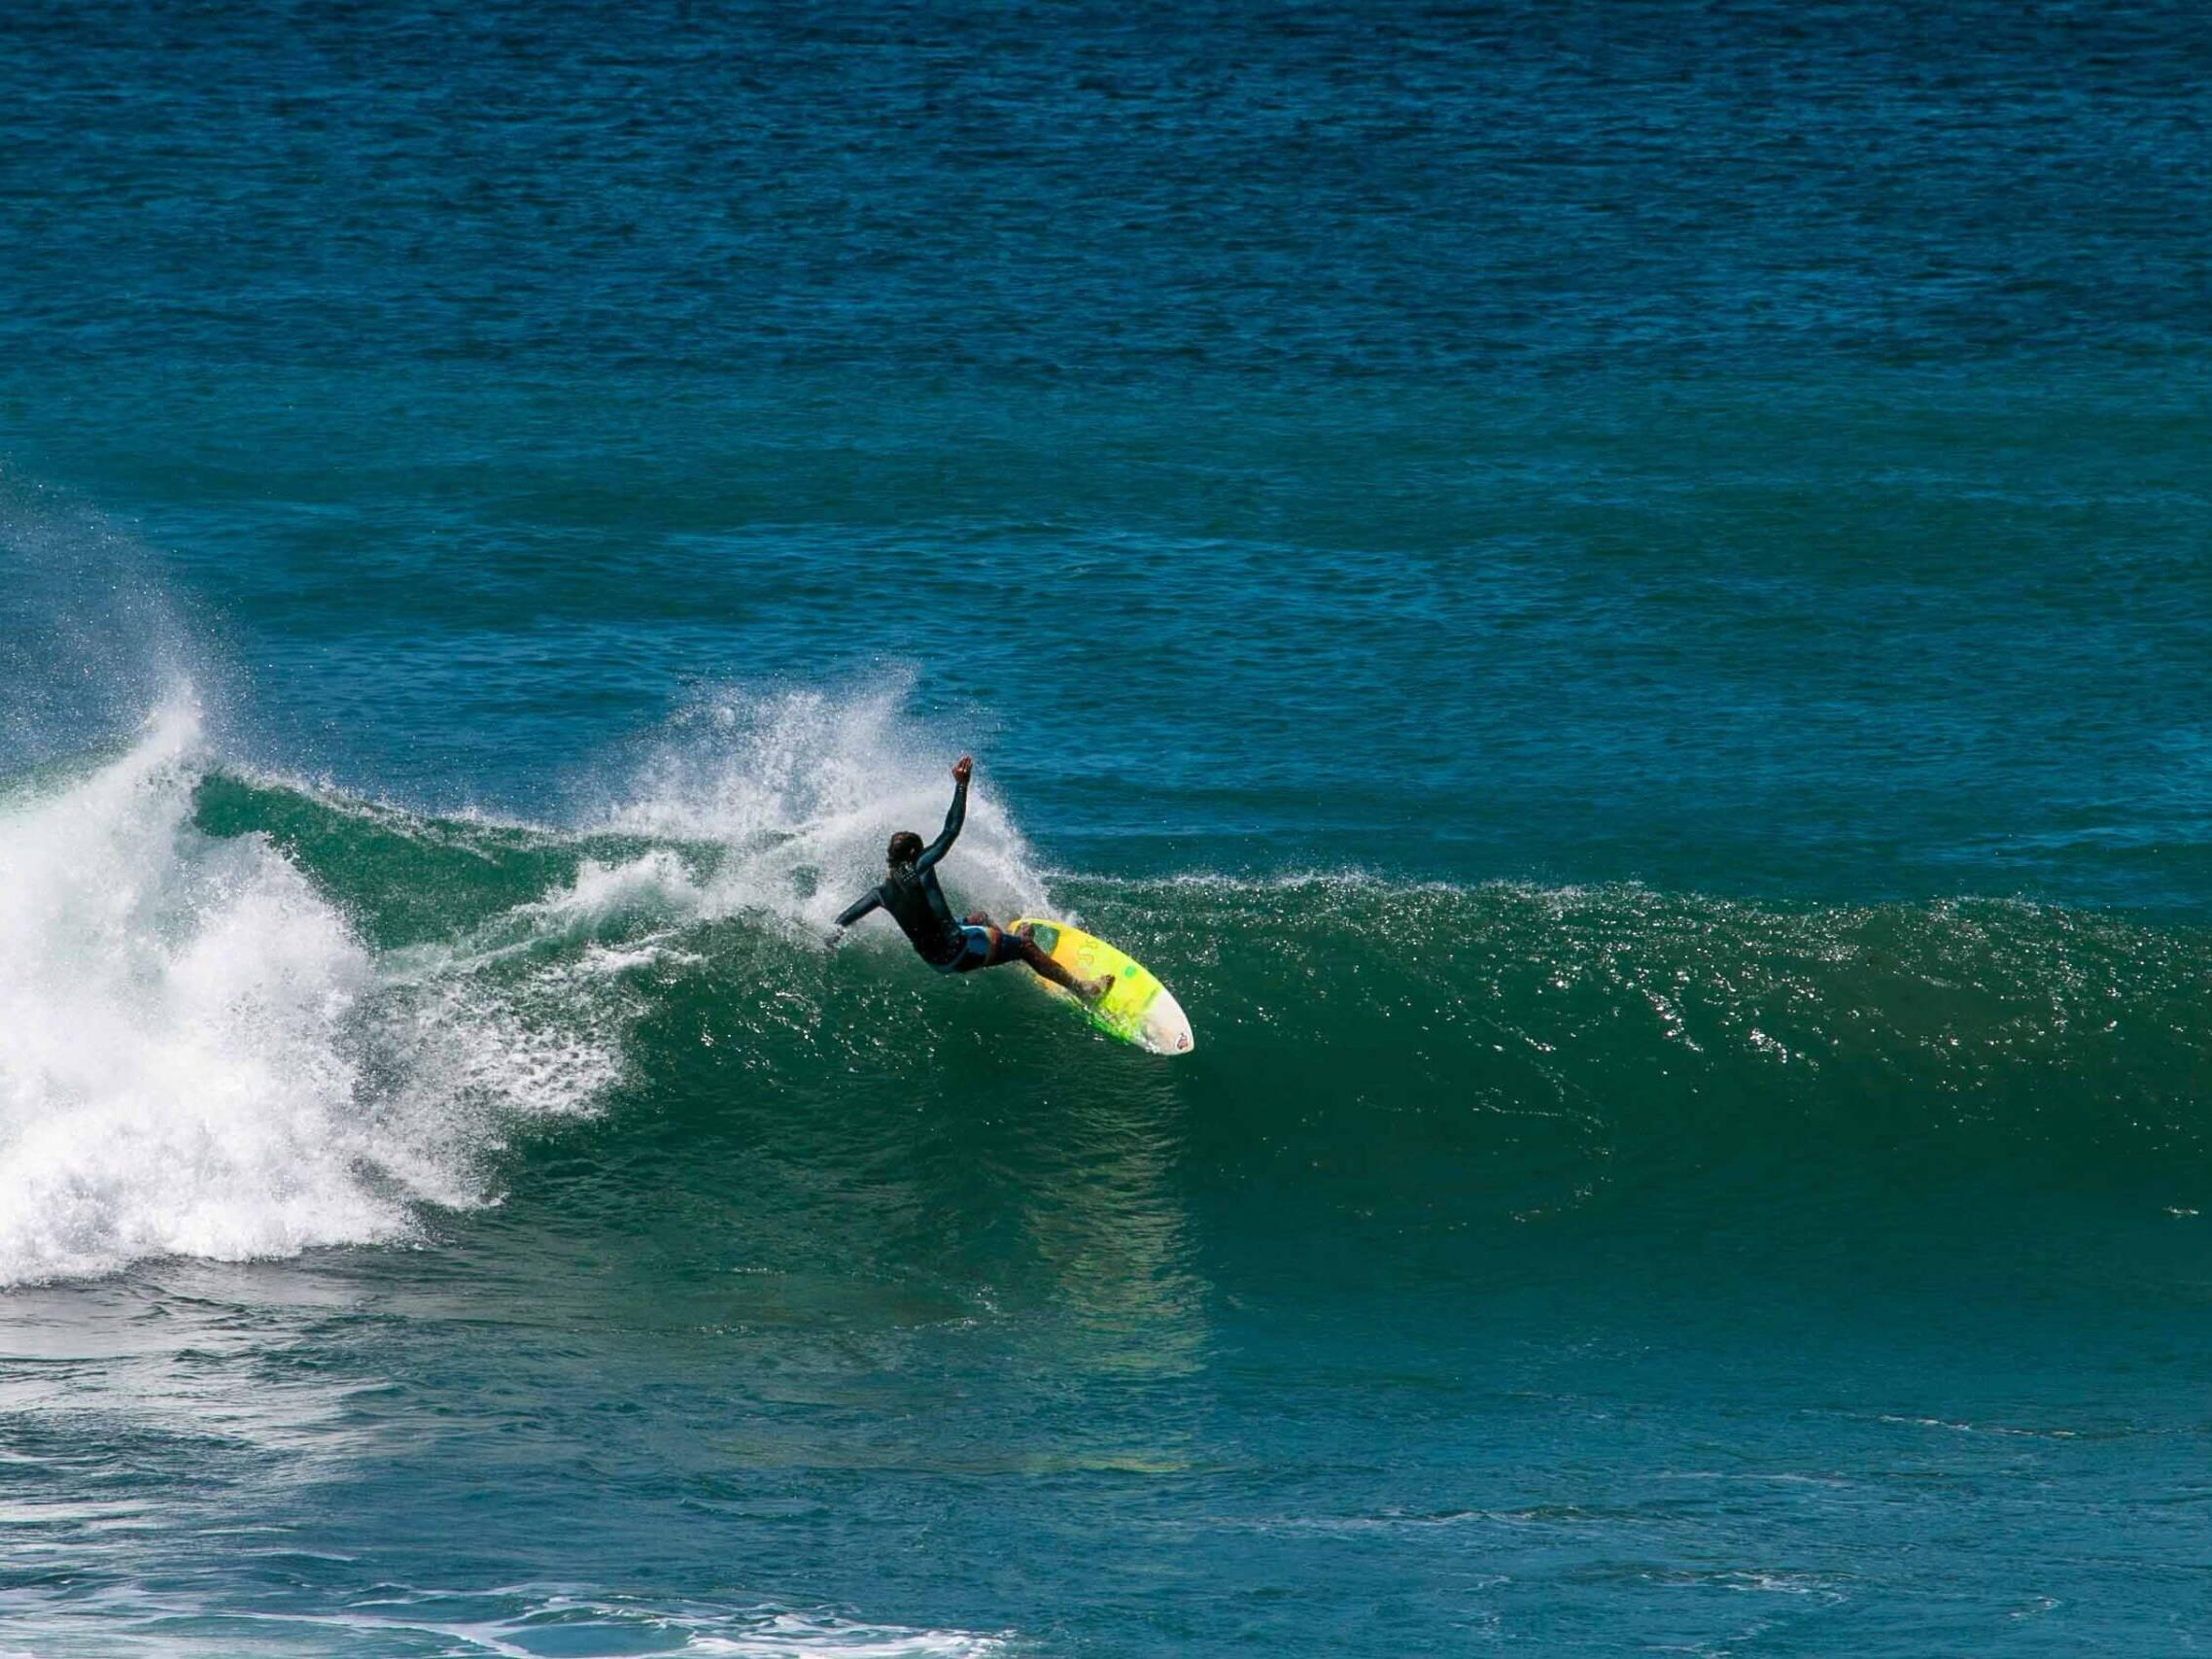 Surfer at Panga Drops at Playa Colorado in Nicaragua